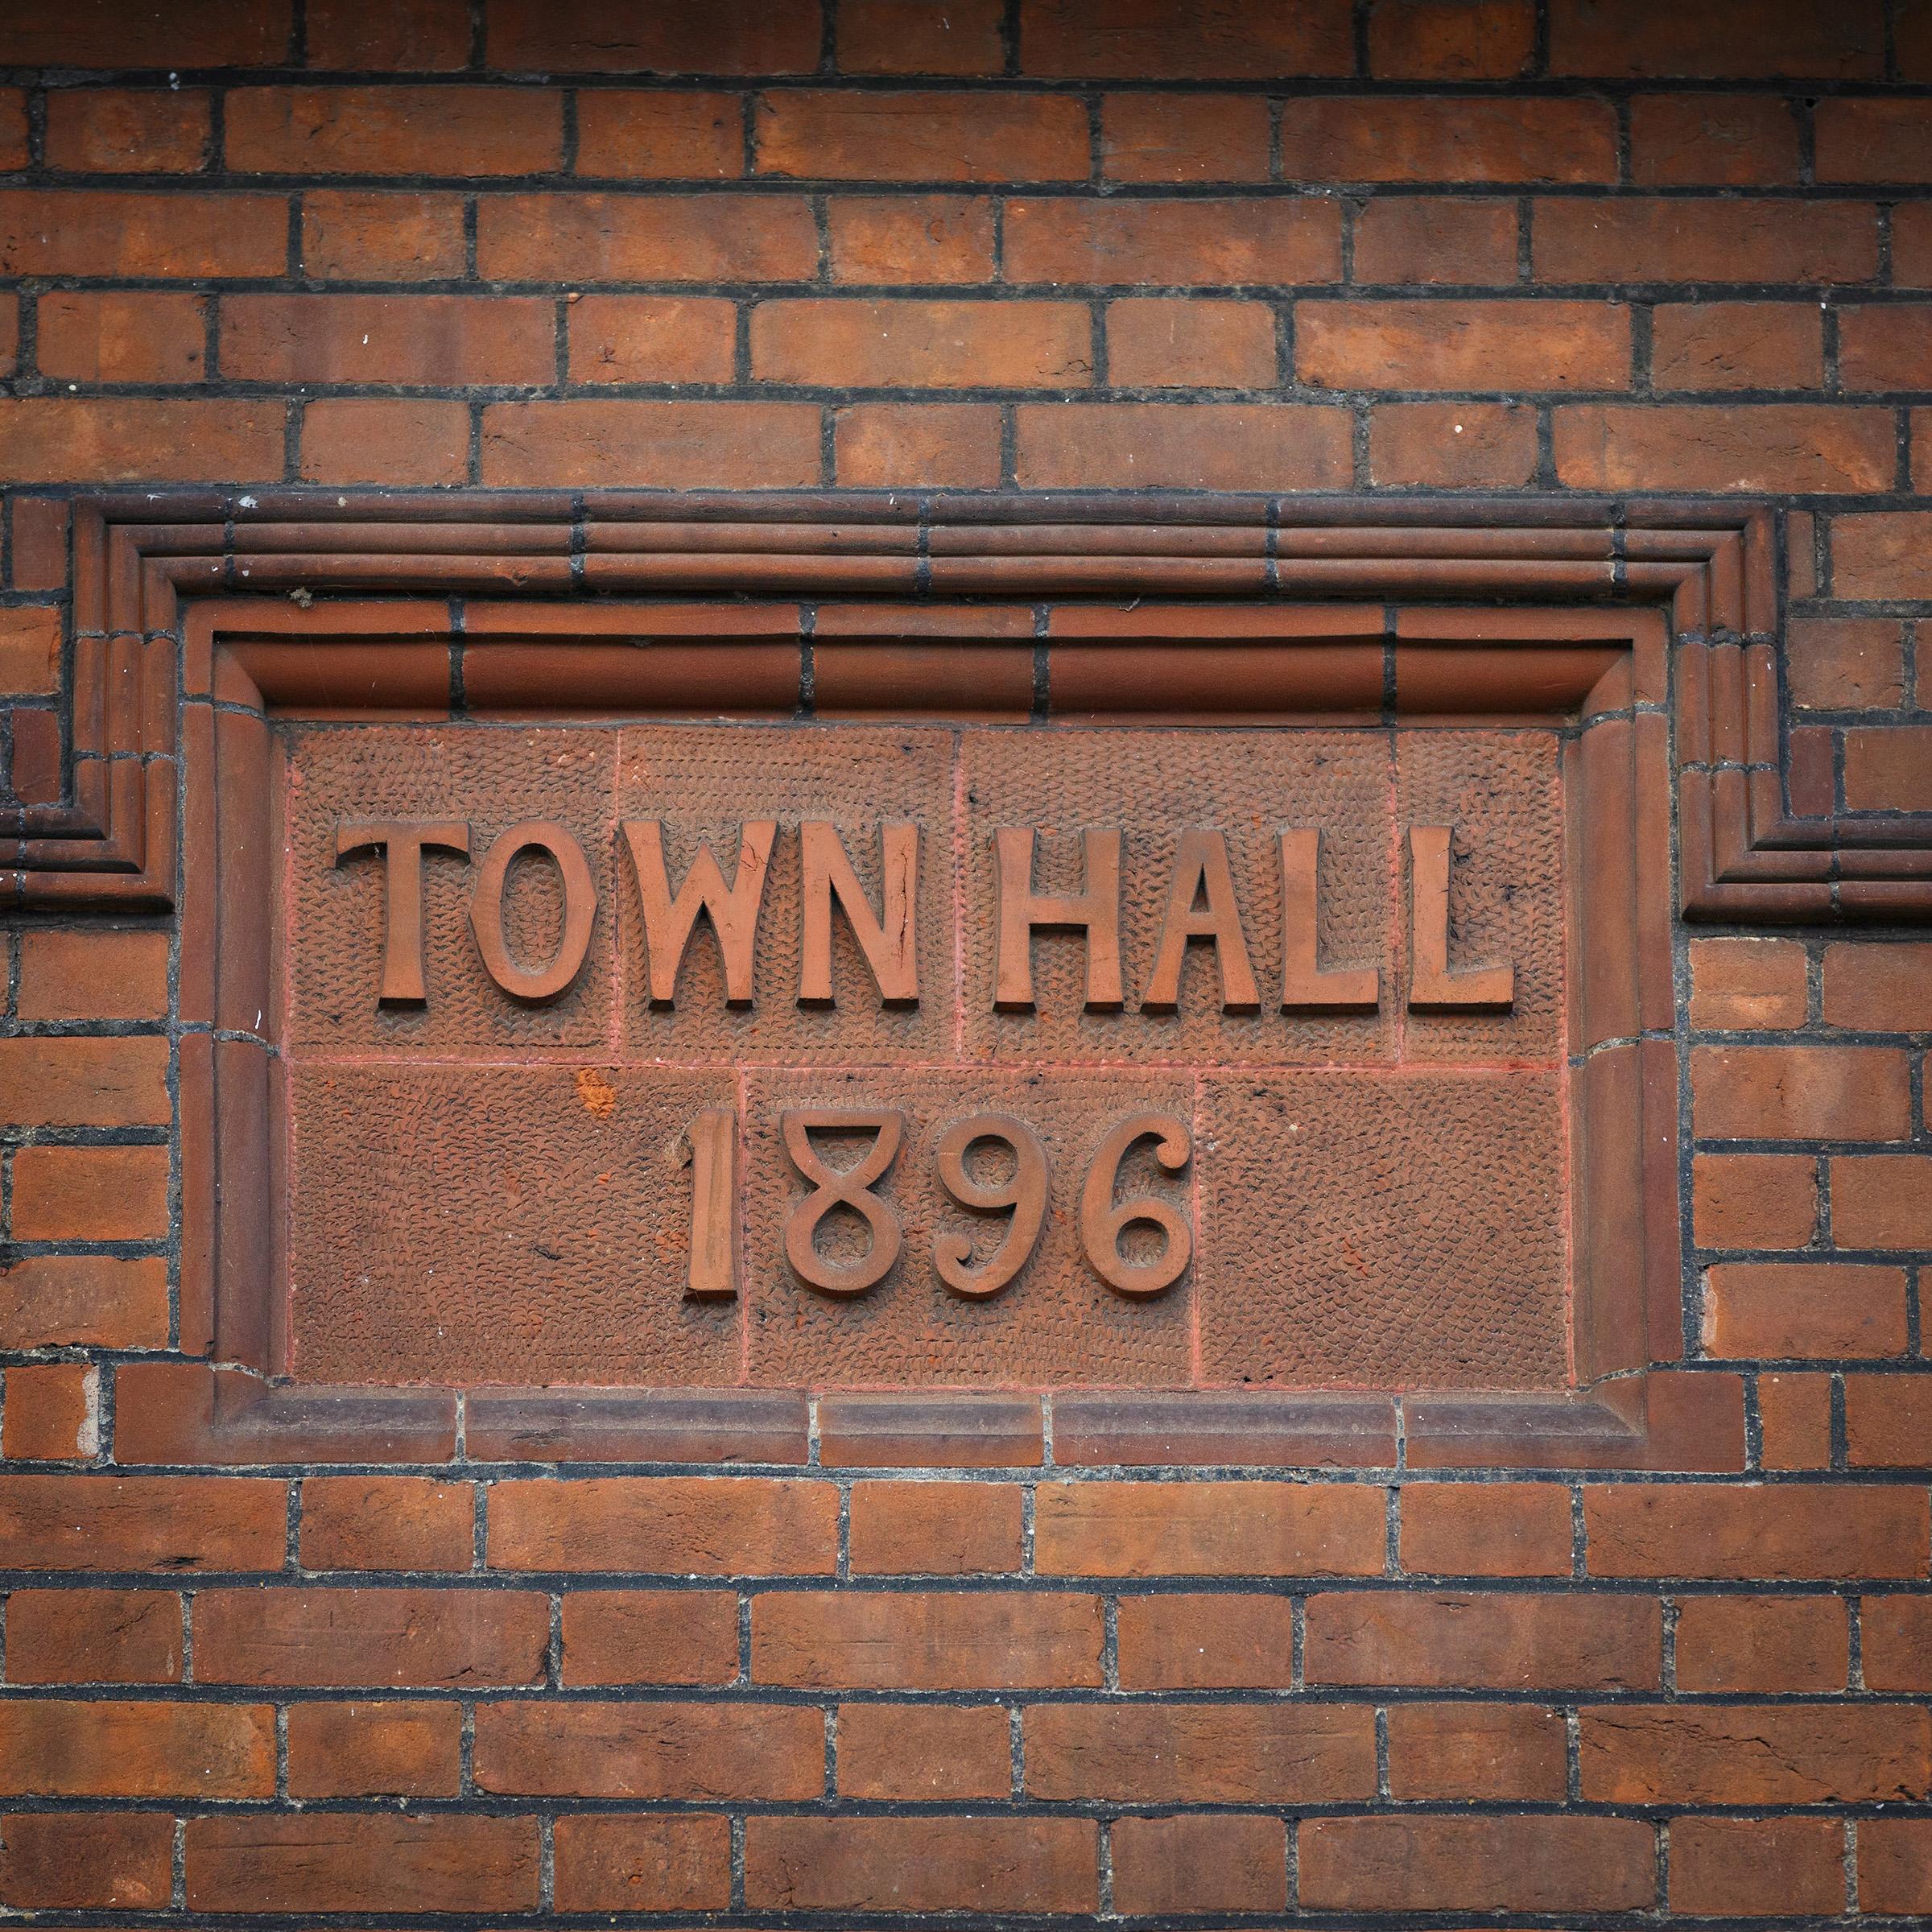 141002-TownHallHo-106